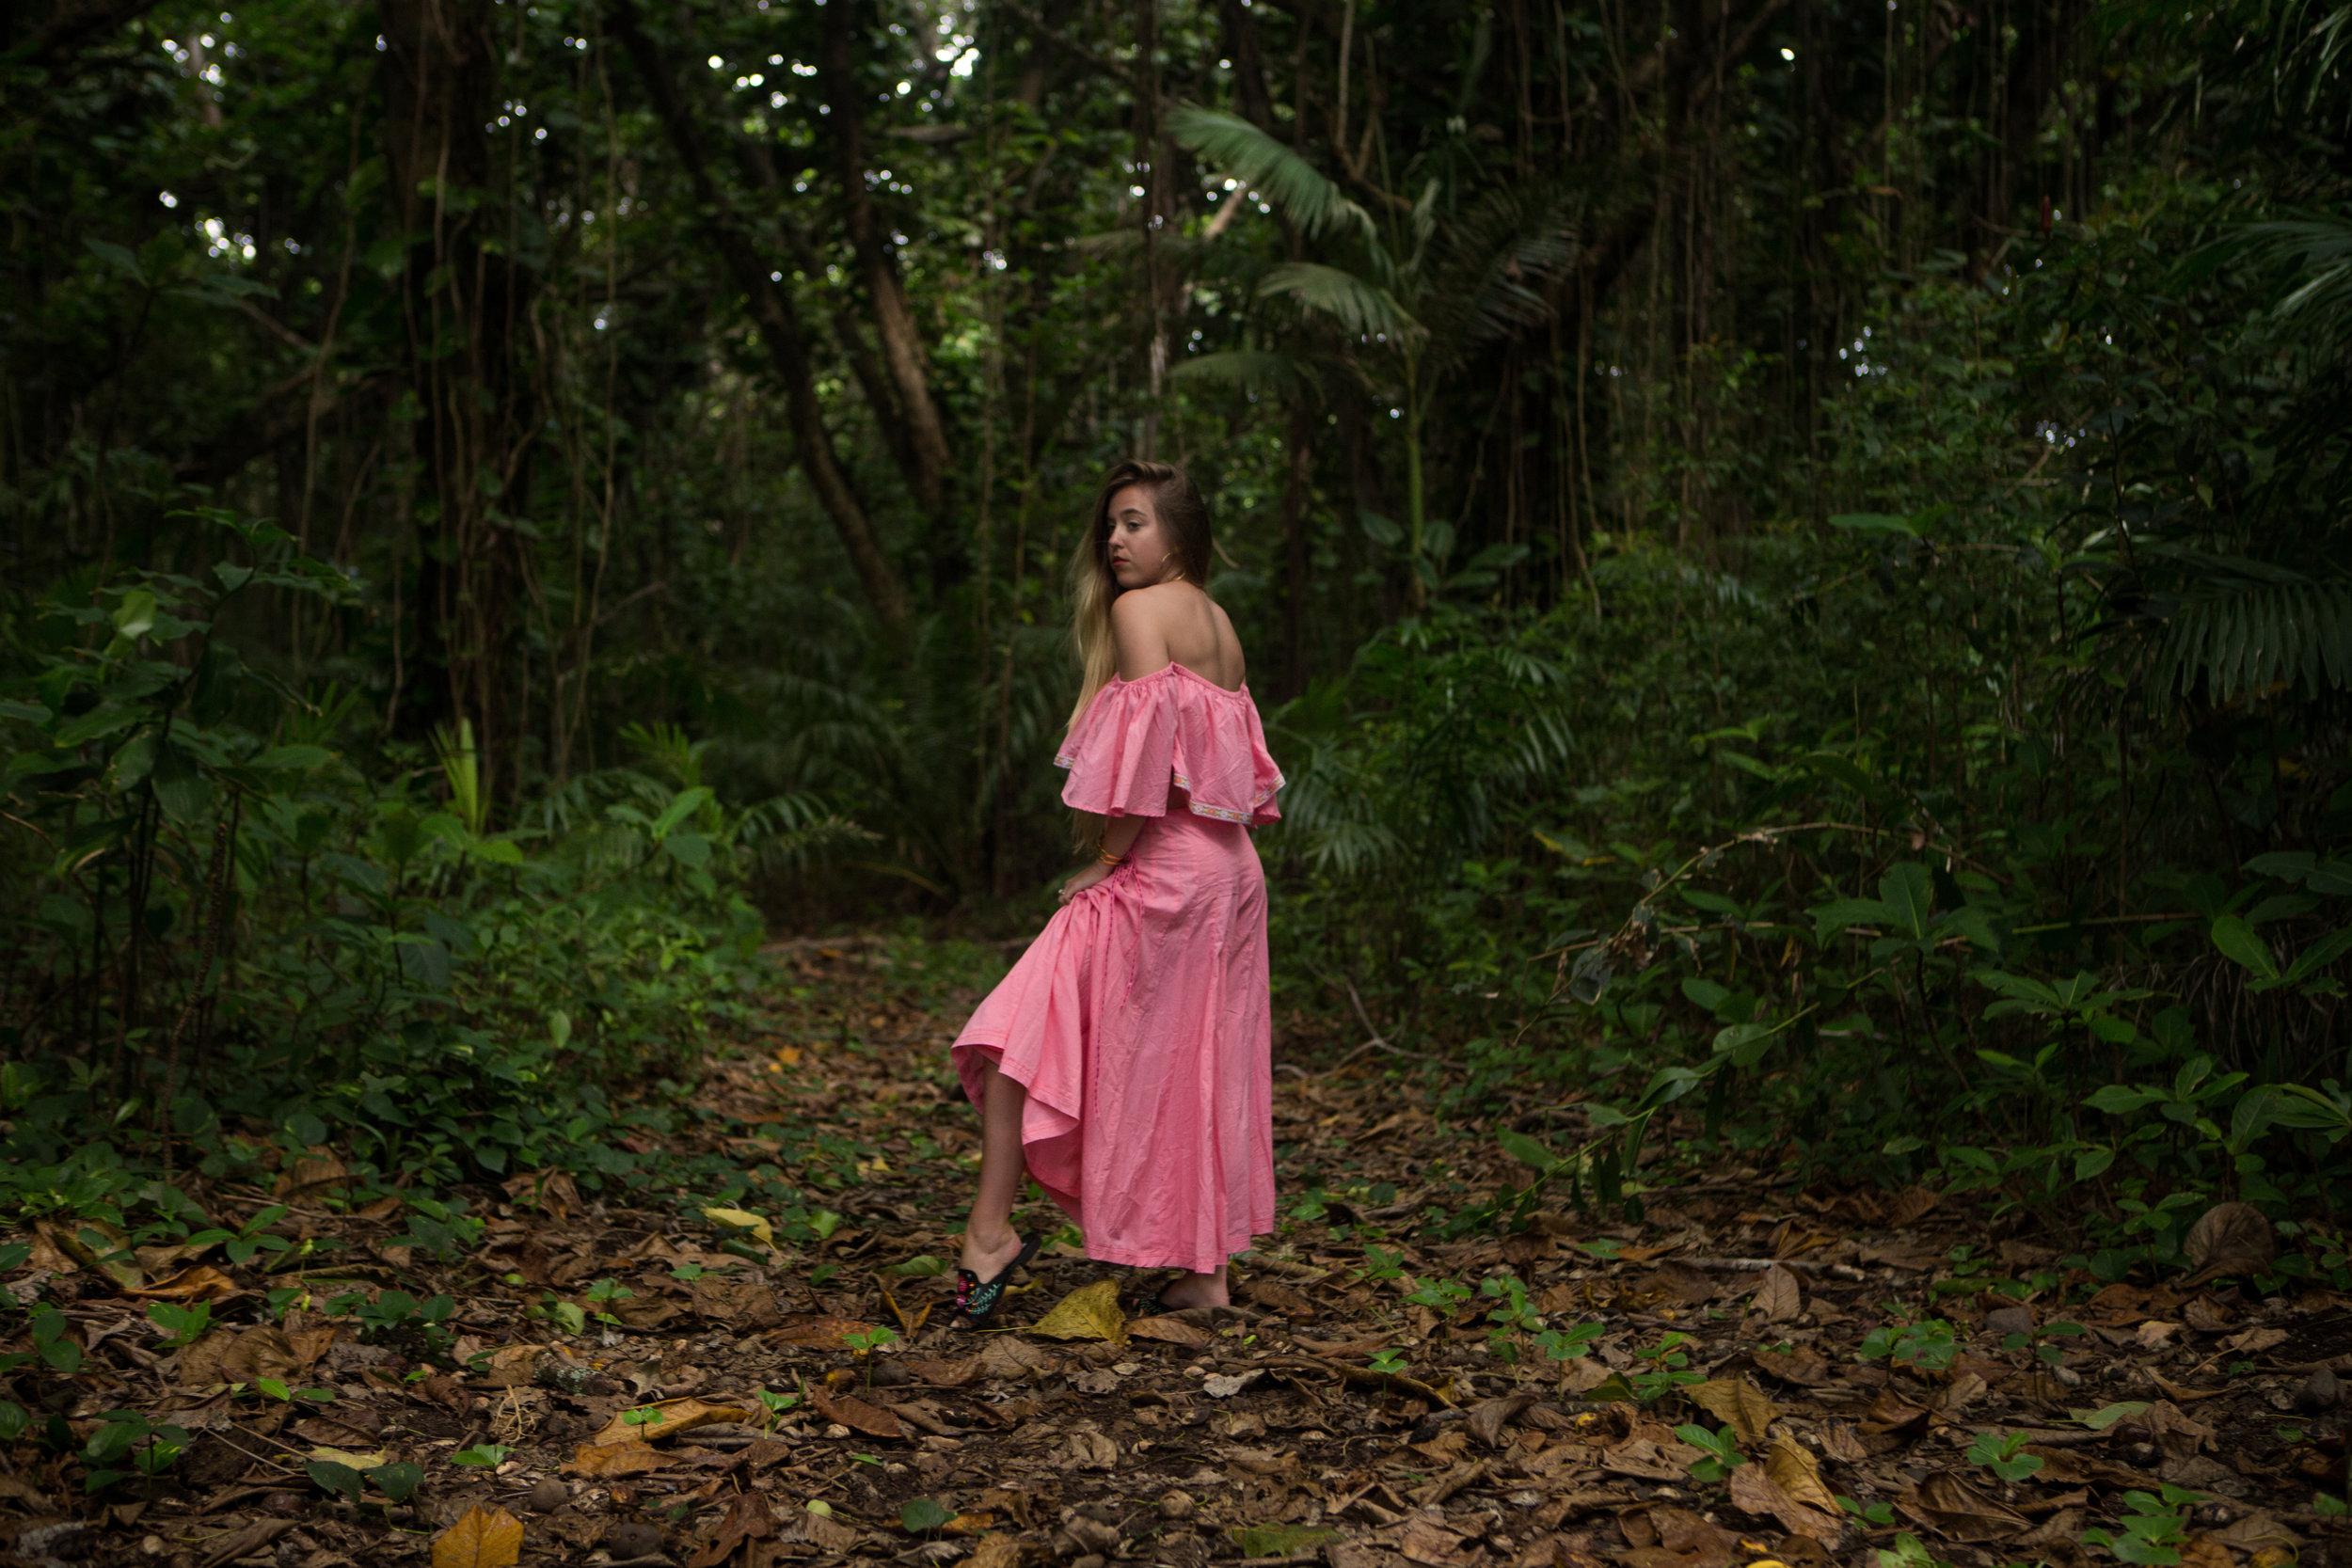 AstroBandit_Maui_Hawaii_JordanRose_Hana_Rainforest_27.jpg